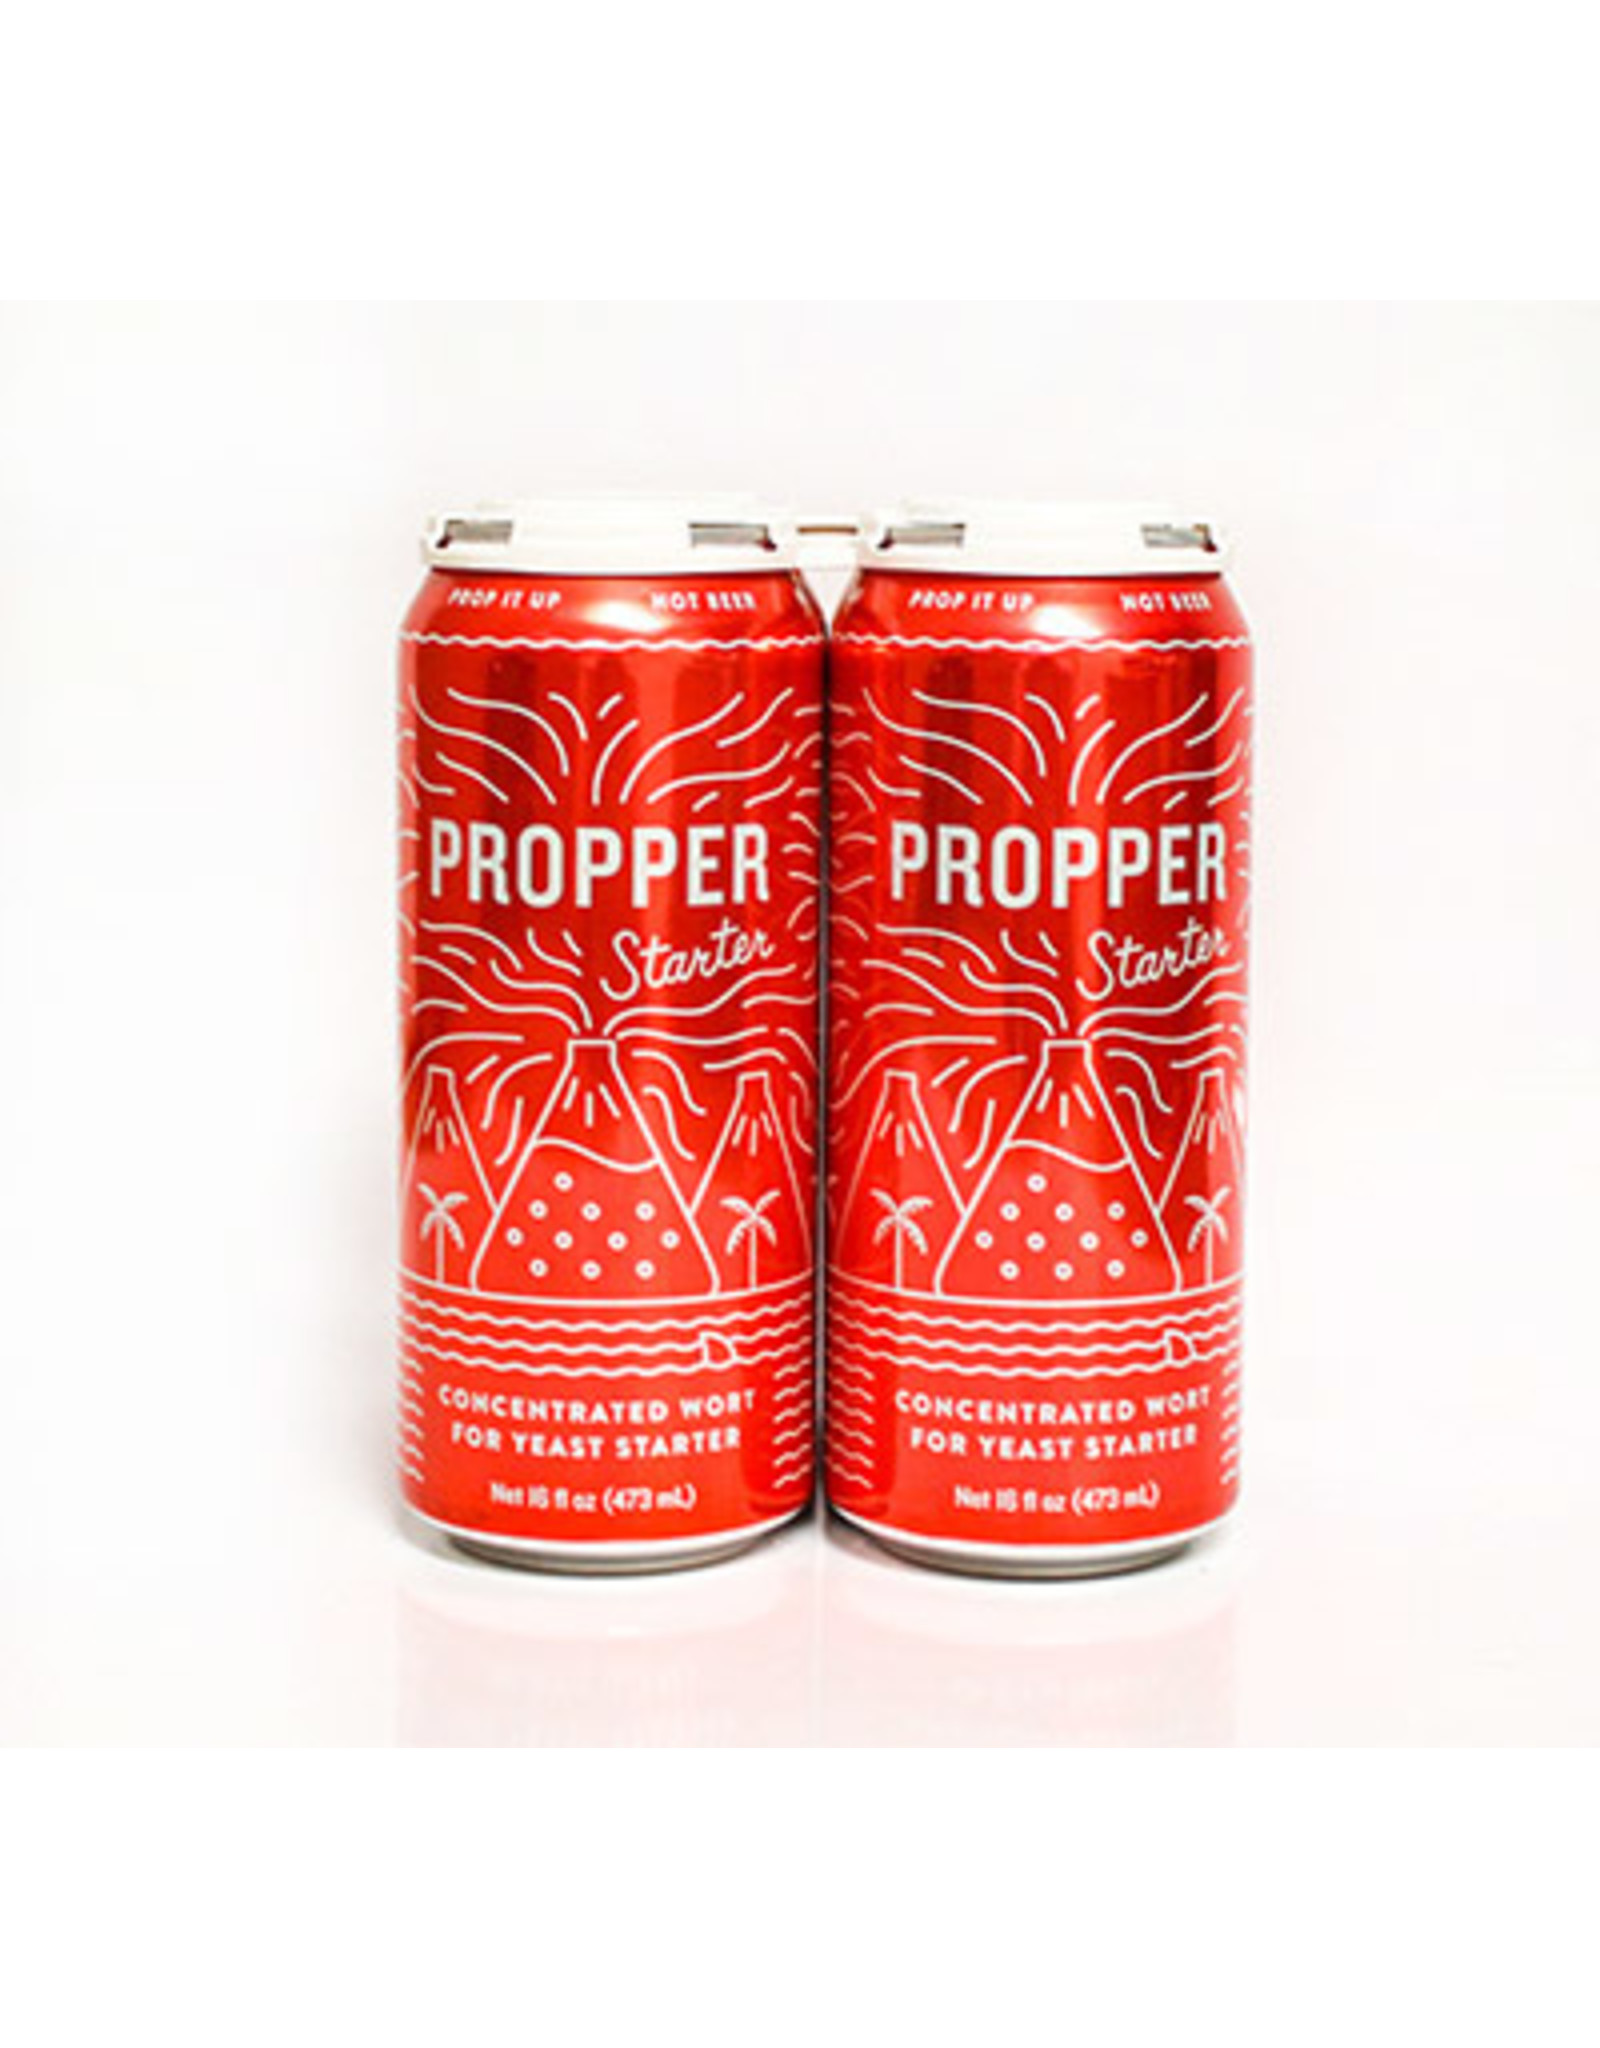 Propper Starter Condensed Wort Can Single - 16 oz